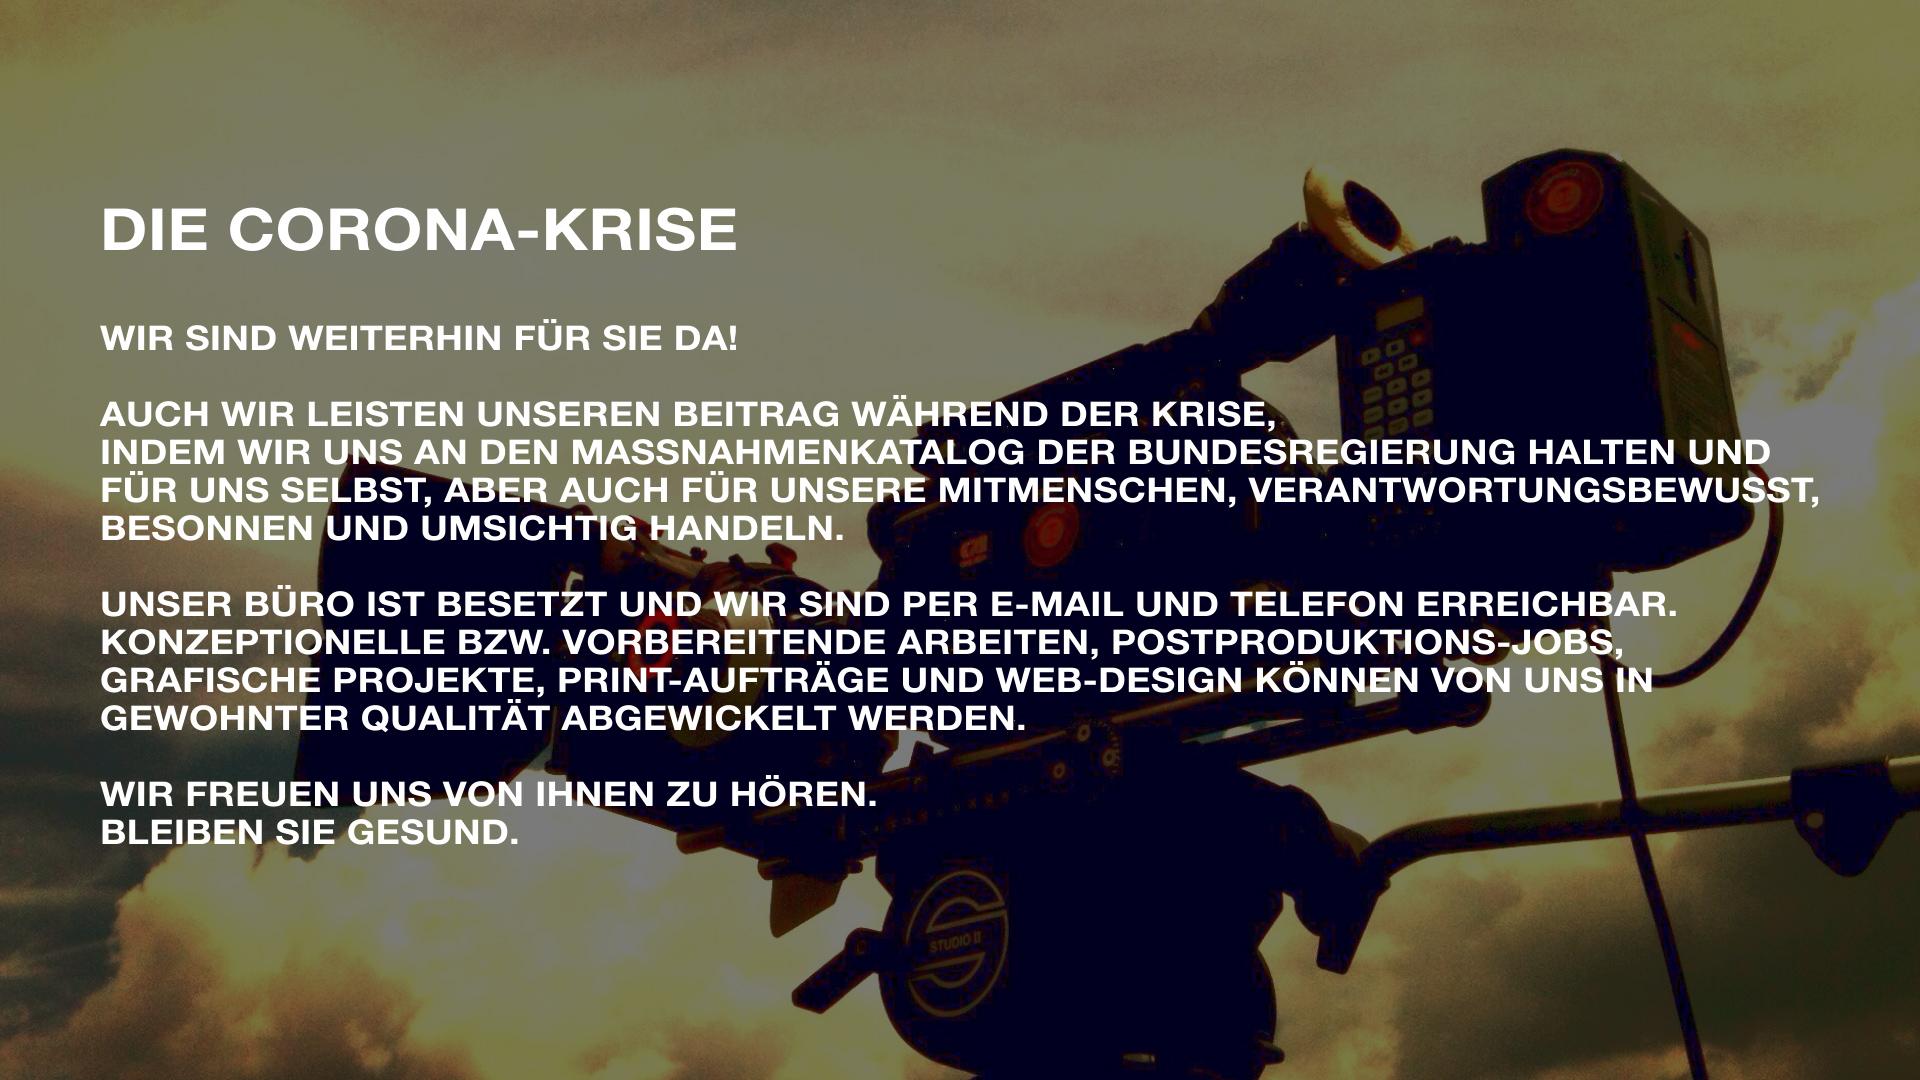 Corona Krise Poster - Strickroth & Fiege Fotografie